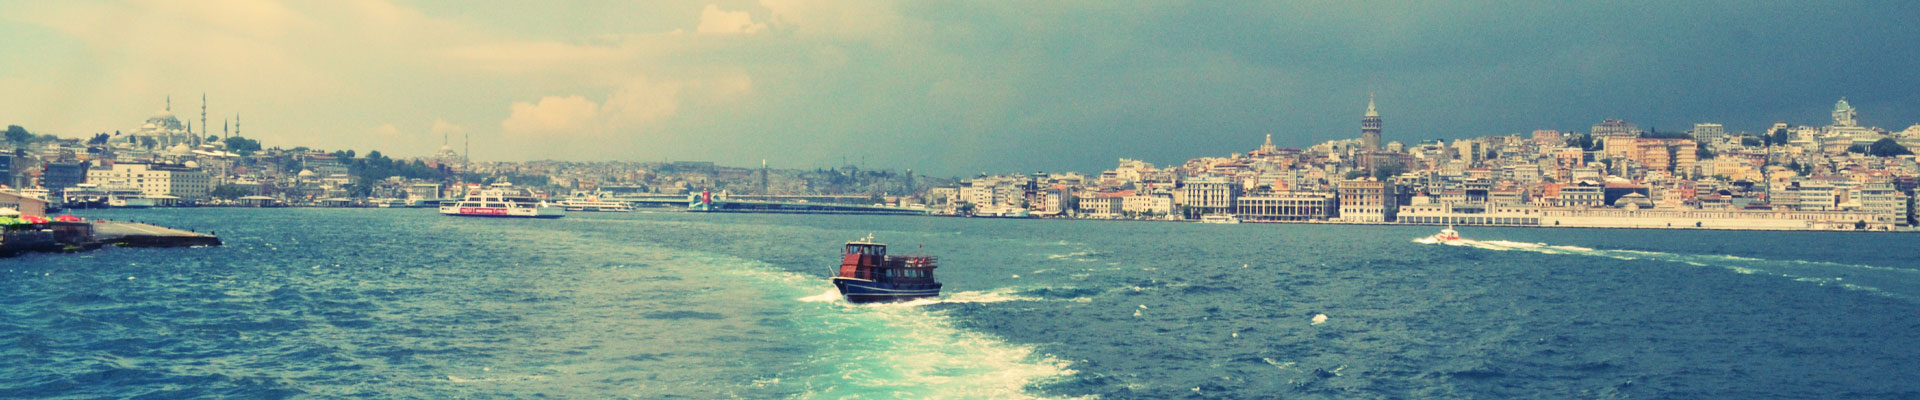 Coastal scene in Turkey